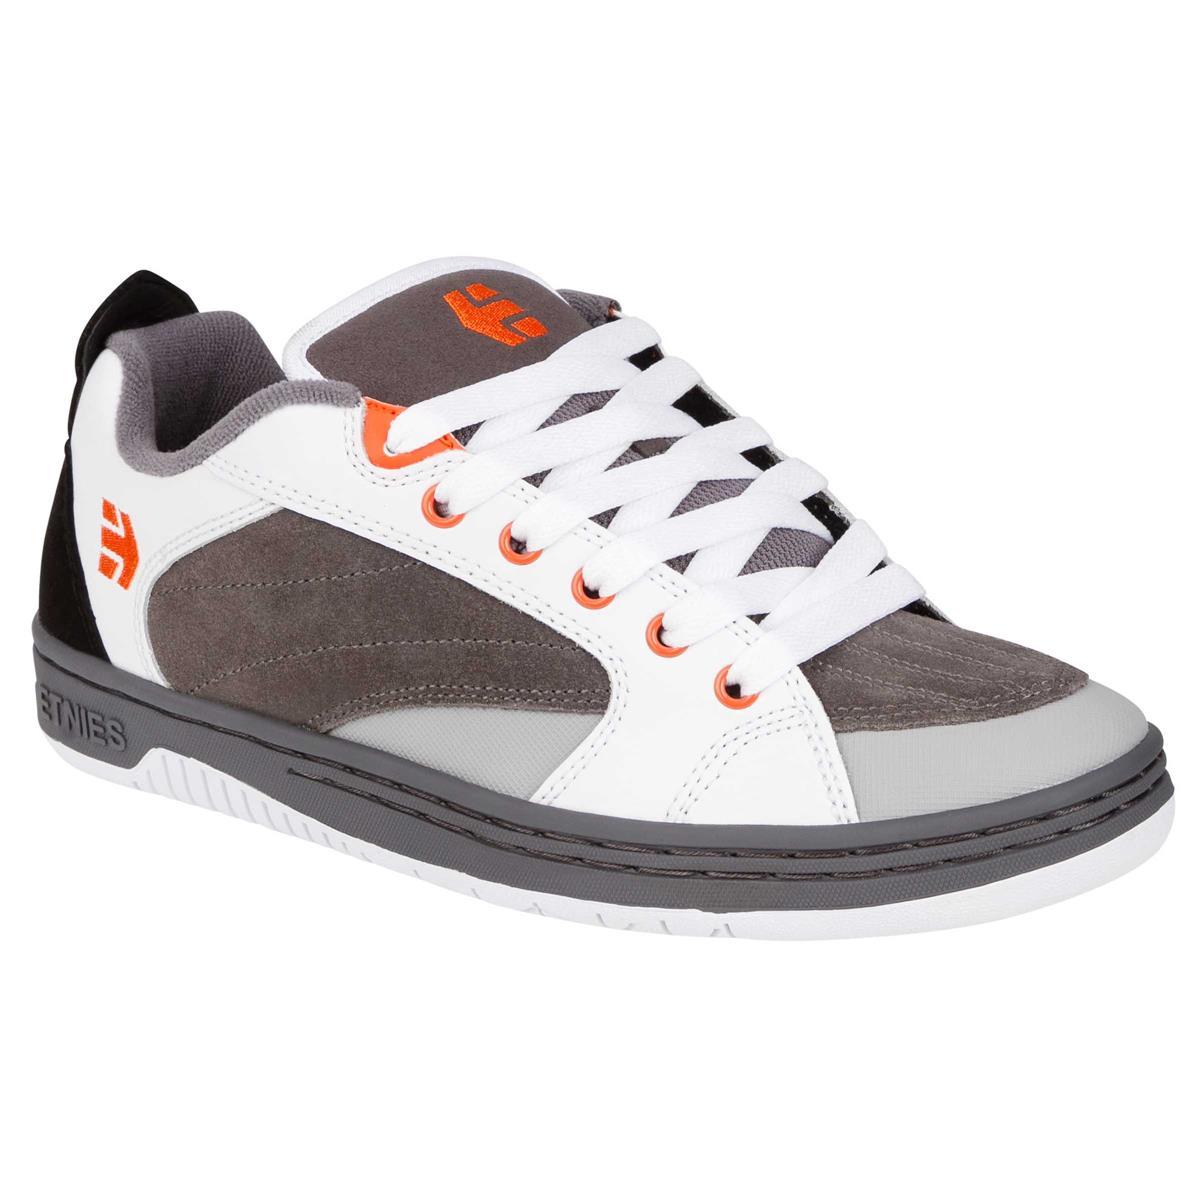 Etnies Schuhe Czar Grau/Weiß/Orange